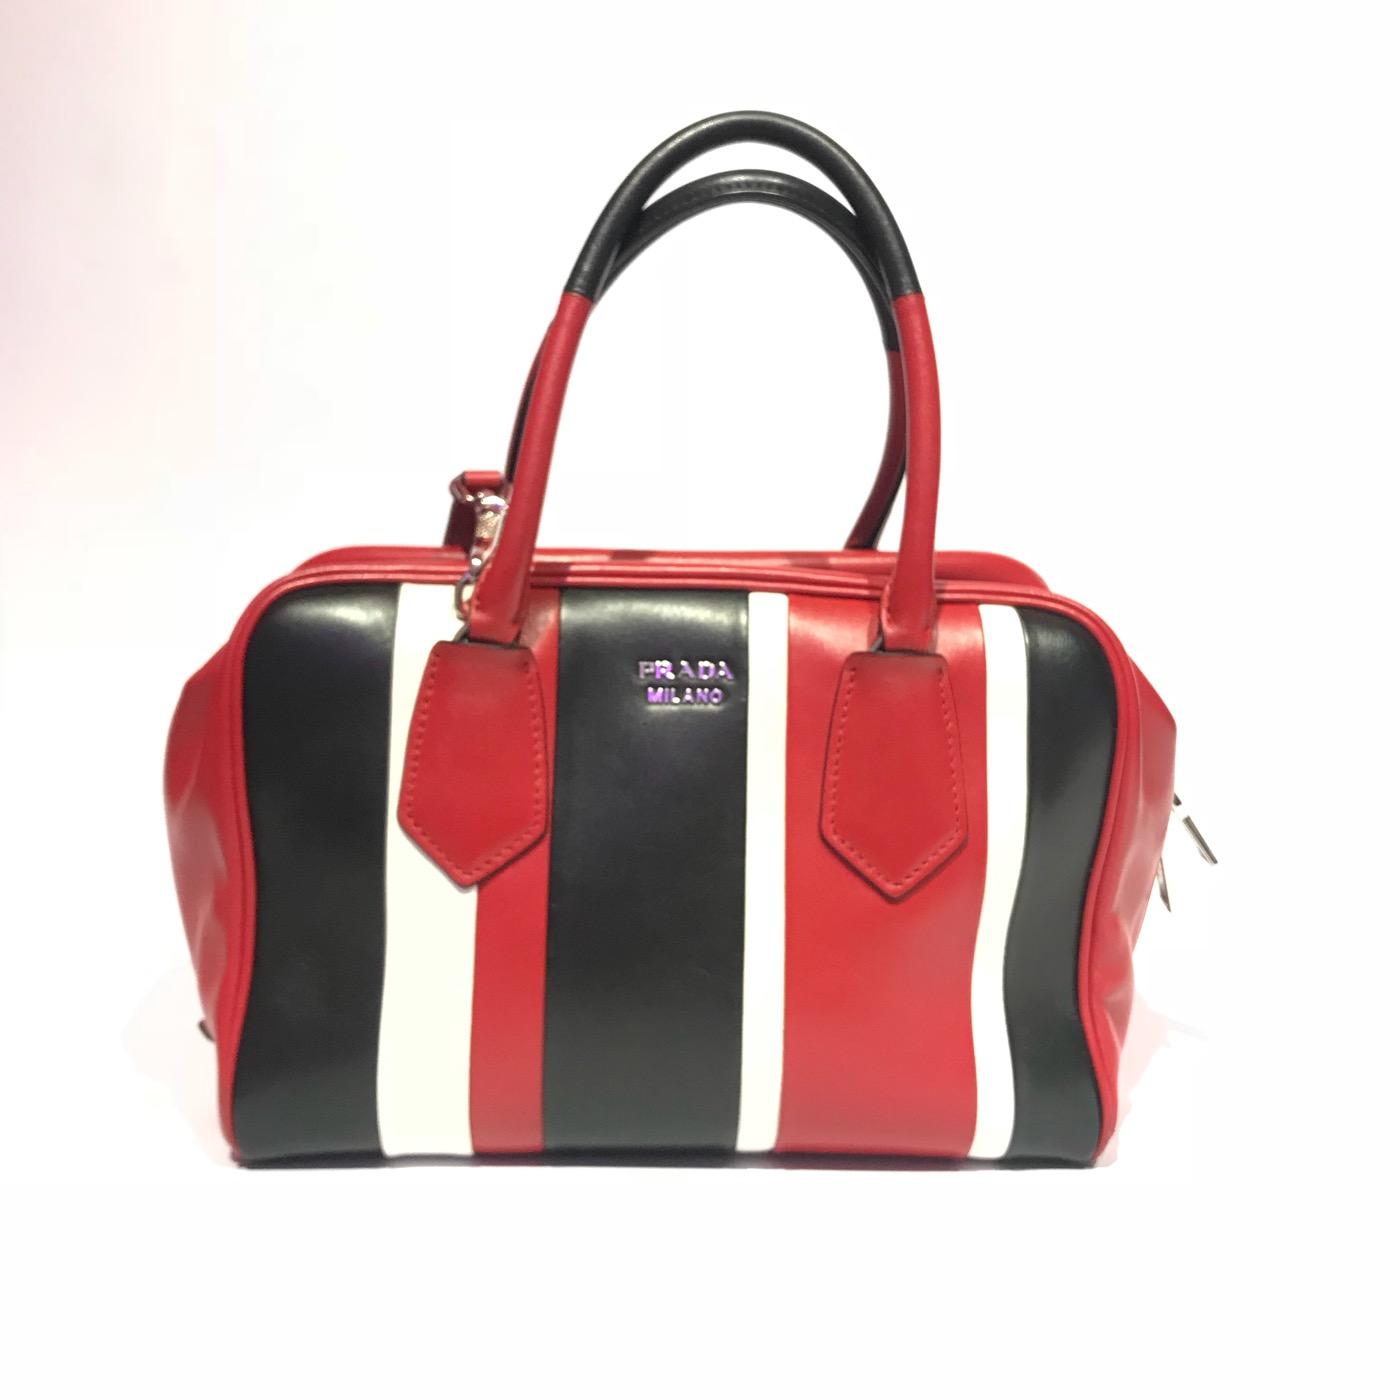 0bd38076386f ... closeout prada multicolor nappa leather top handle handbag b8210 2f88a